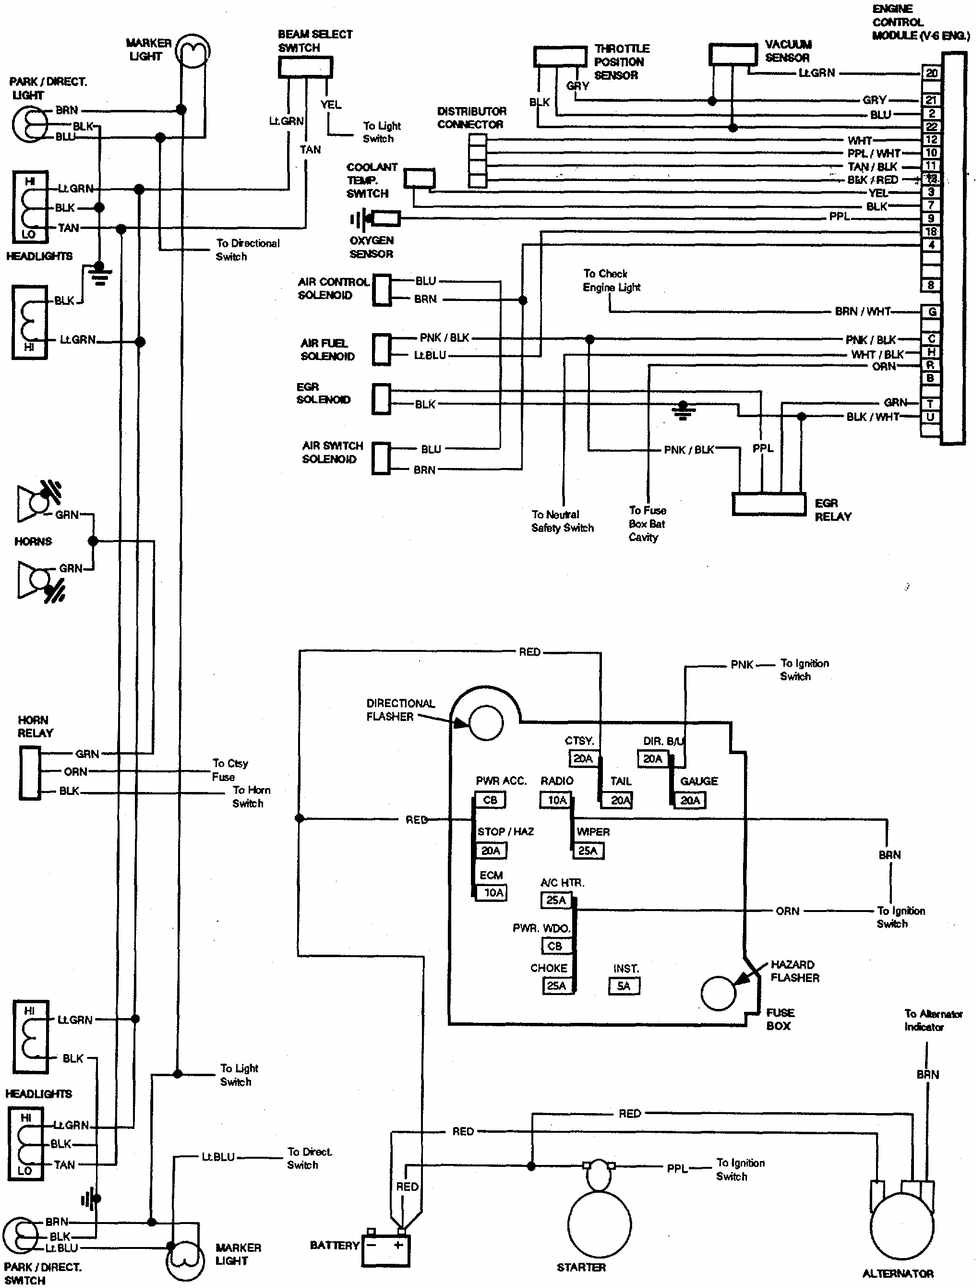 Admirable 1954 M37 Wiring Diagram Basic Electronics Wiring Diagram Wiring Cloud Hemtshollocom